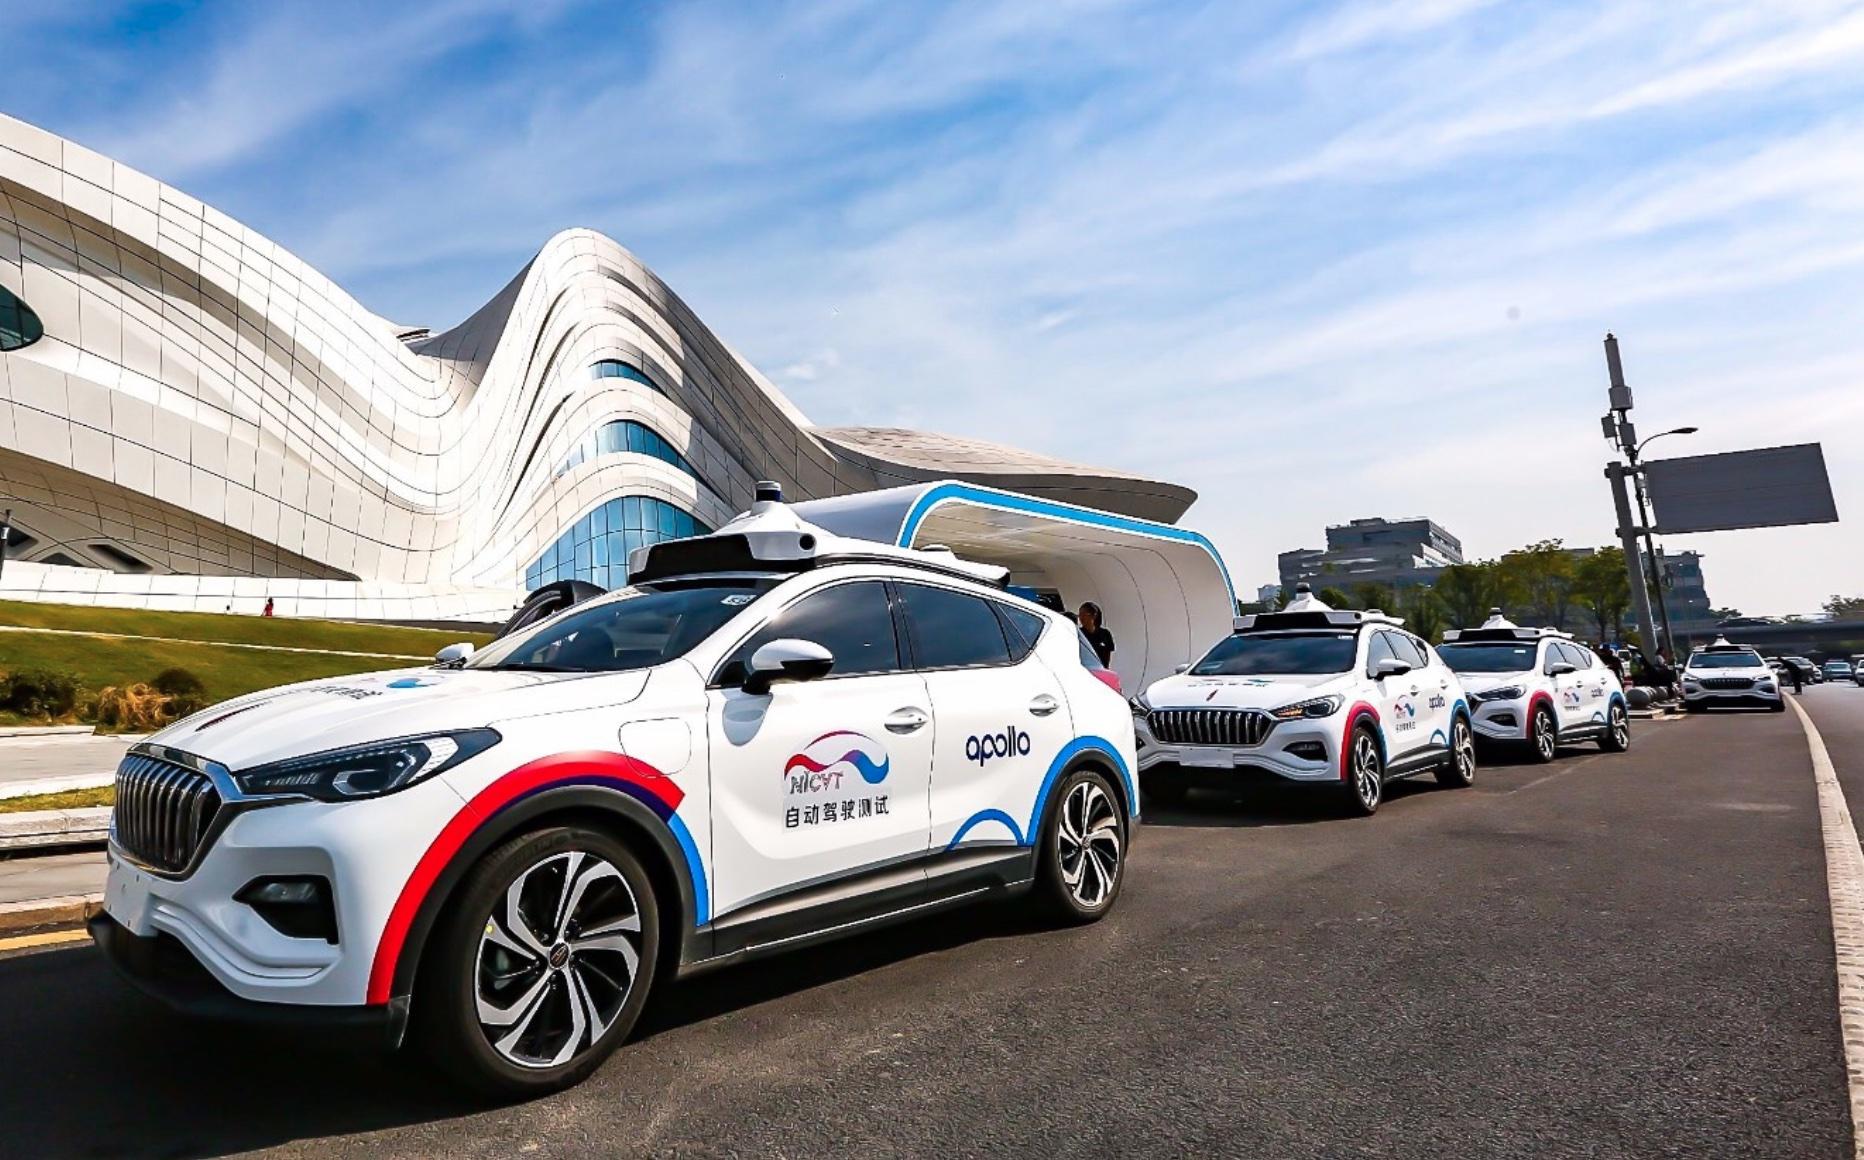 Baidu Apollo opens manned autopilot test in Beijing-CnTechPost